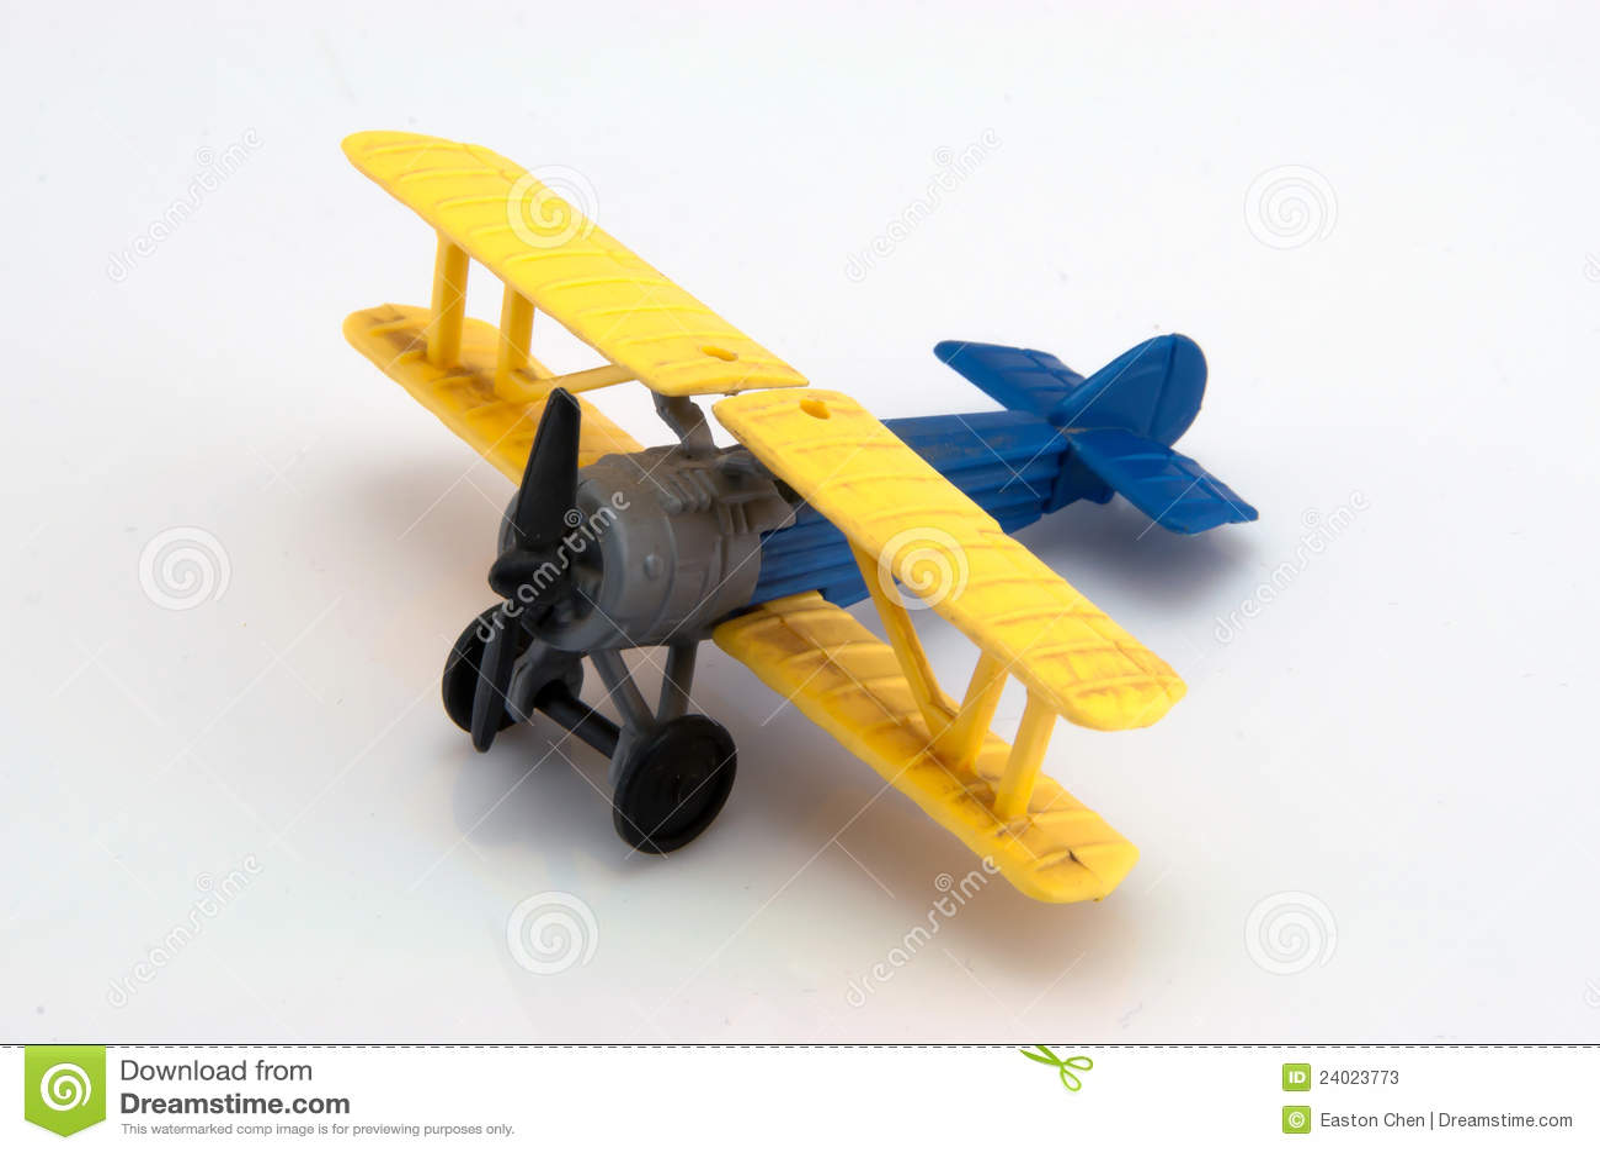 Plastic Airplane Toys 76